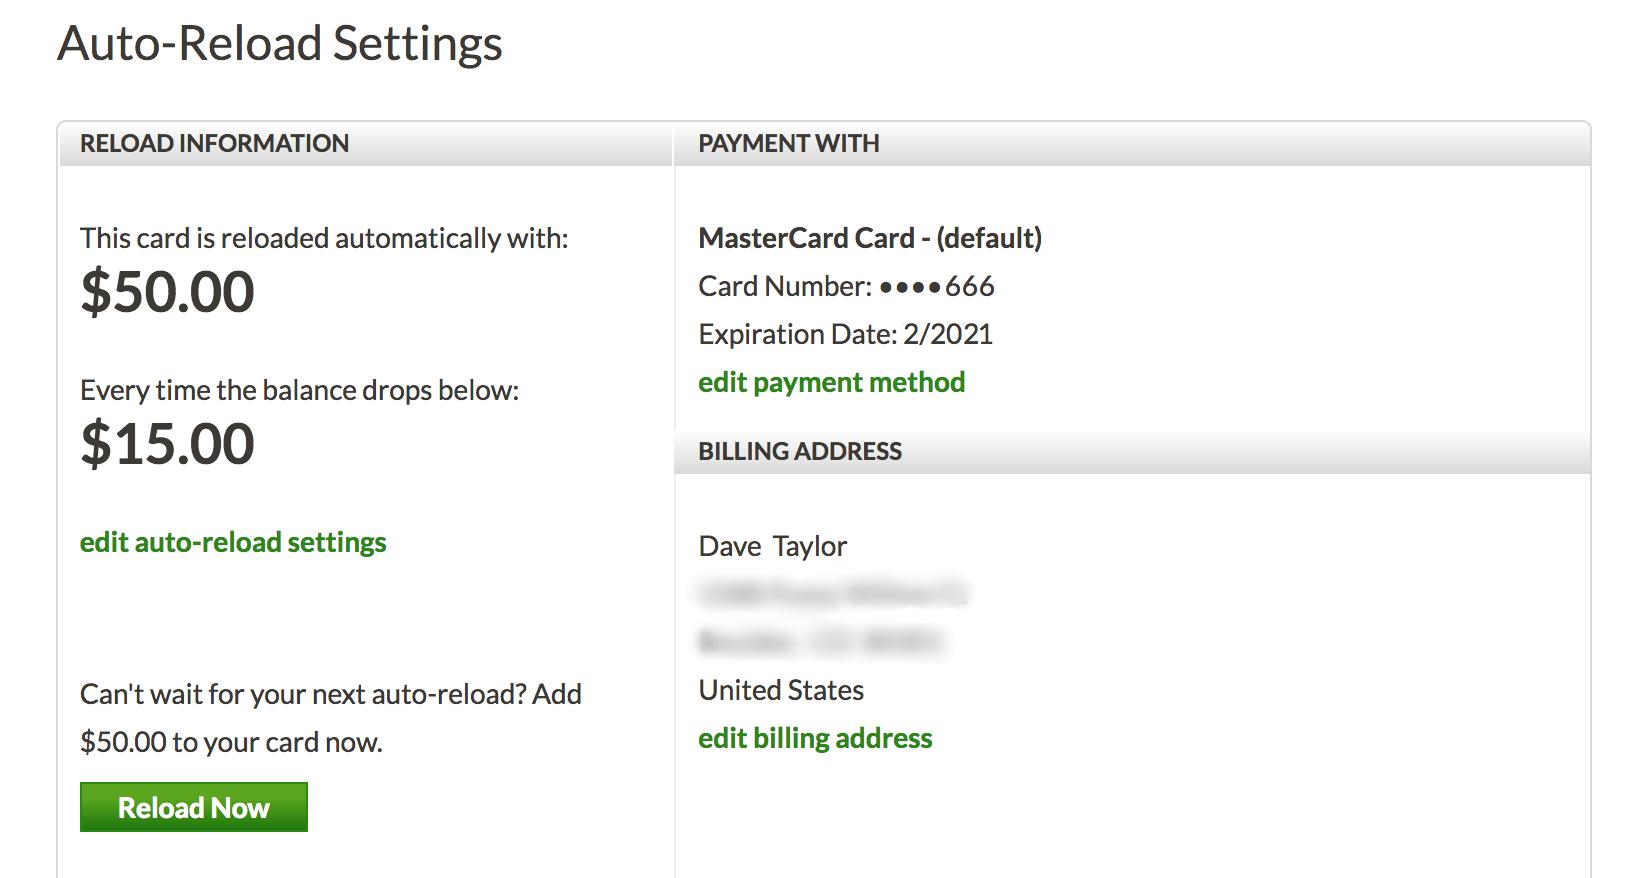 account details, starbucks card